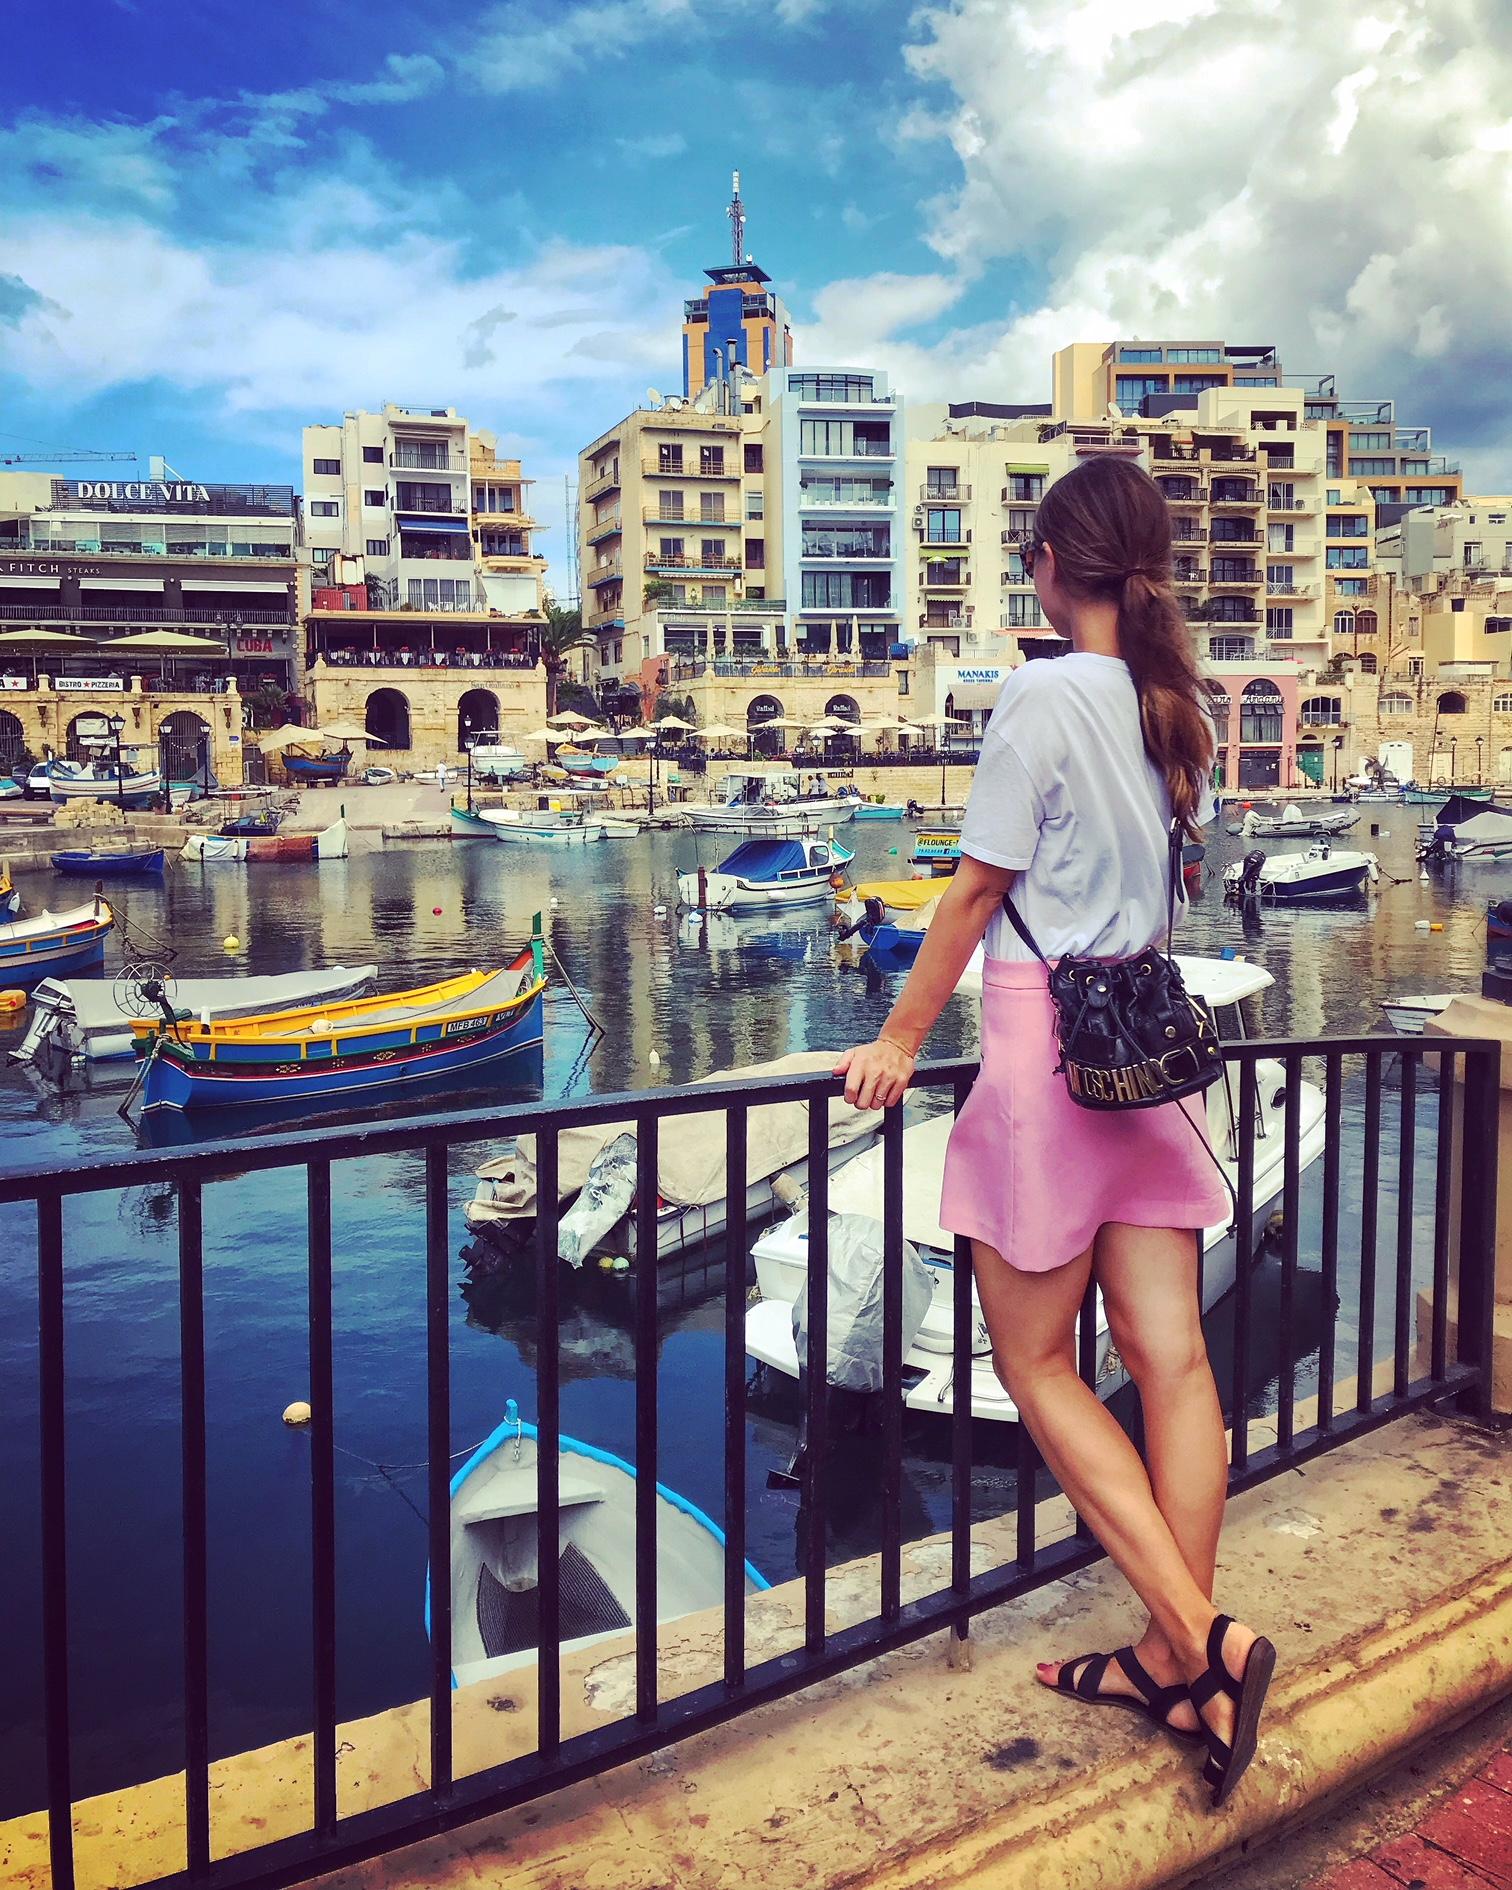 St. Julian's (Maltese: San Giljan)